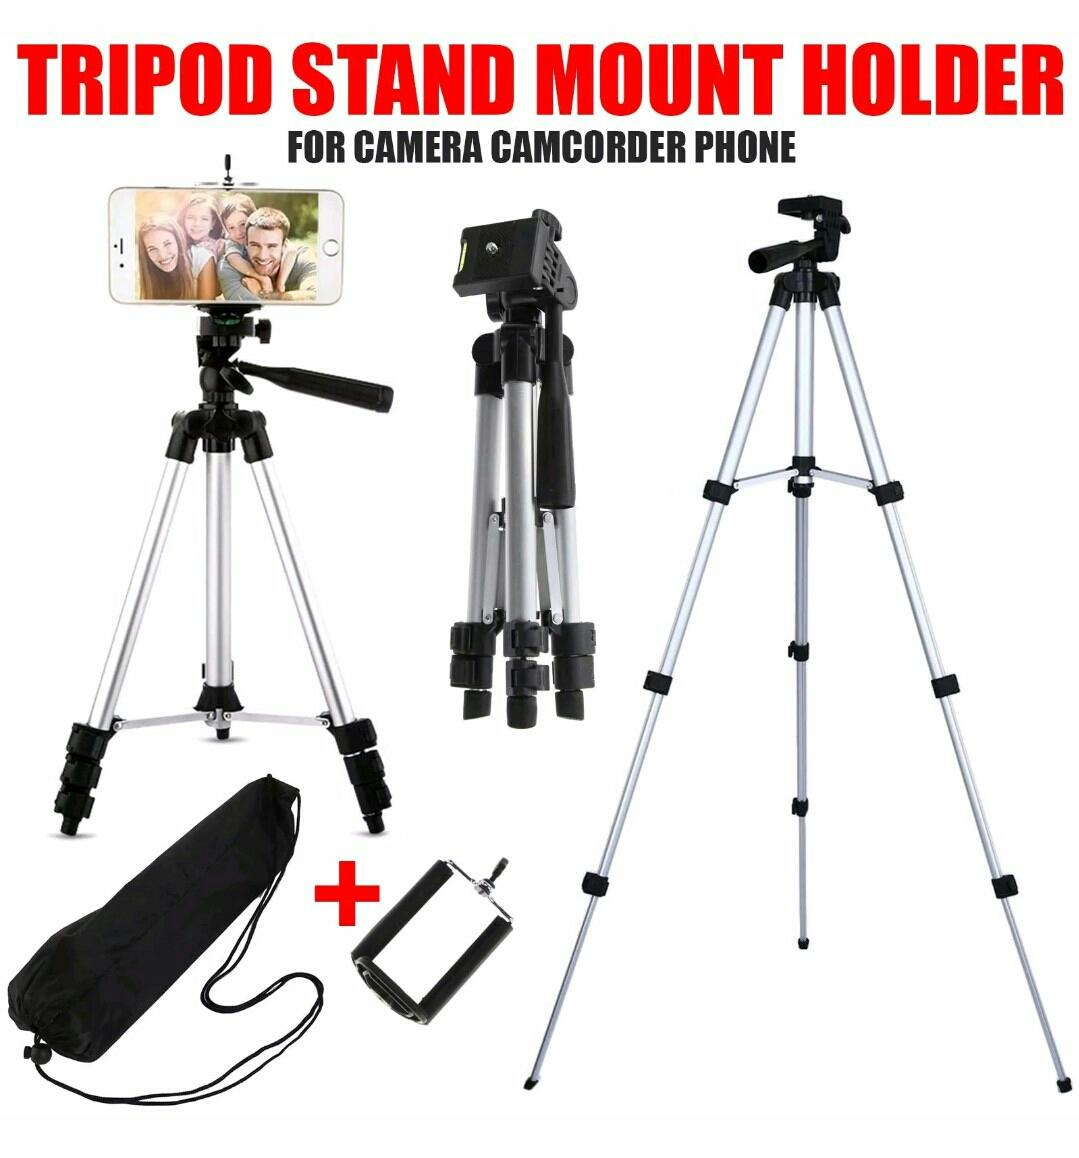 Ringstar Portable Tripod Stand 4 Section Aluminium Legs With Brace Weifeng Kamera Dslr Dan Handphone 1 M